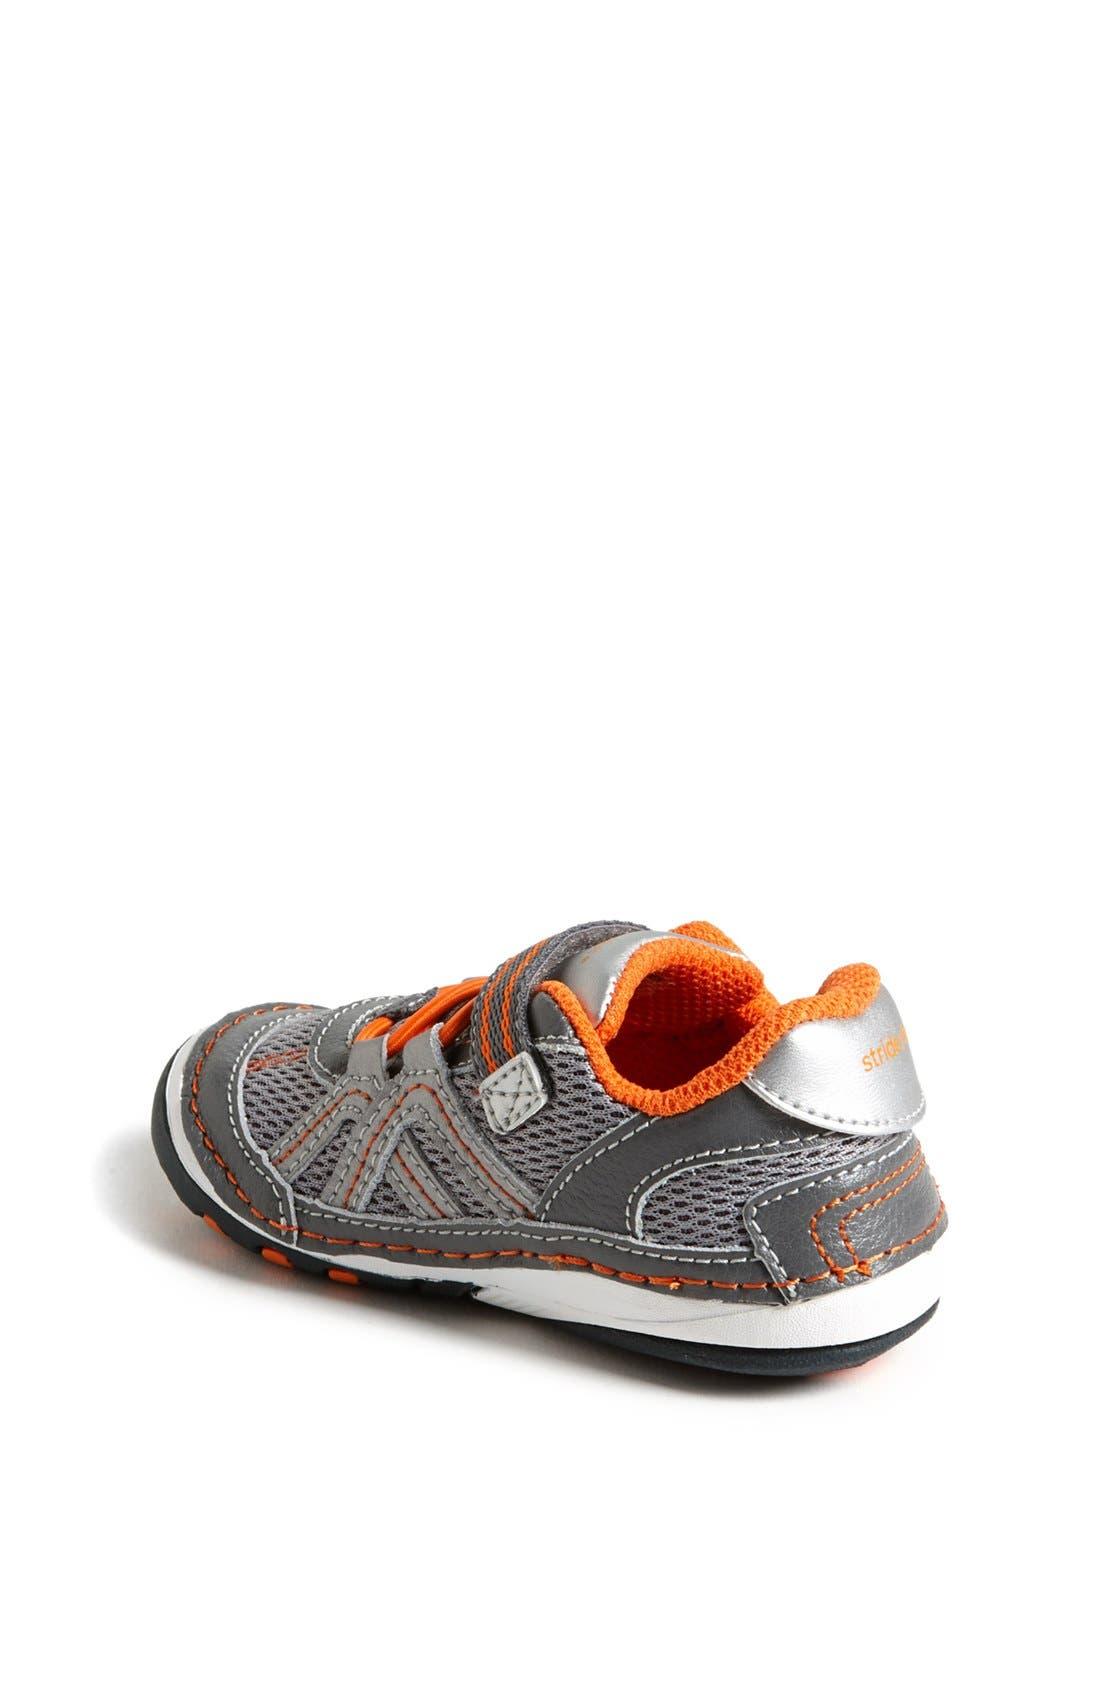 Alternate Image 2  - Stride Rite 'Damien' Sneaker (Baby & Walker)